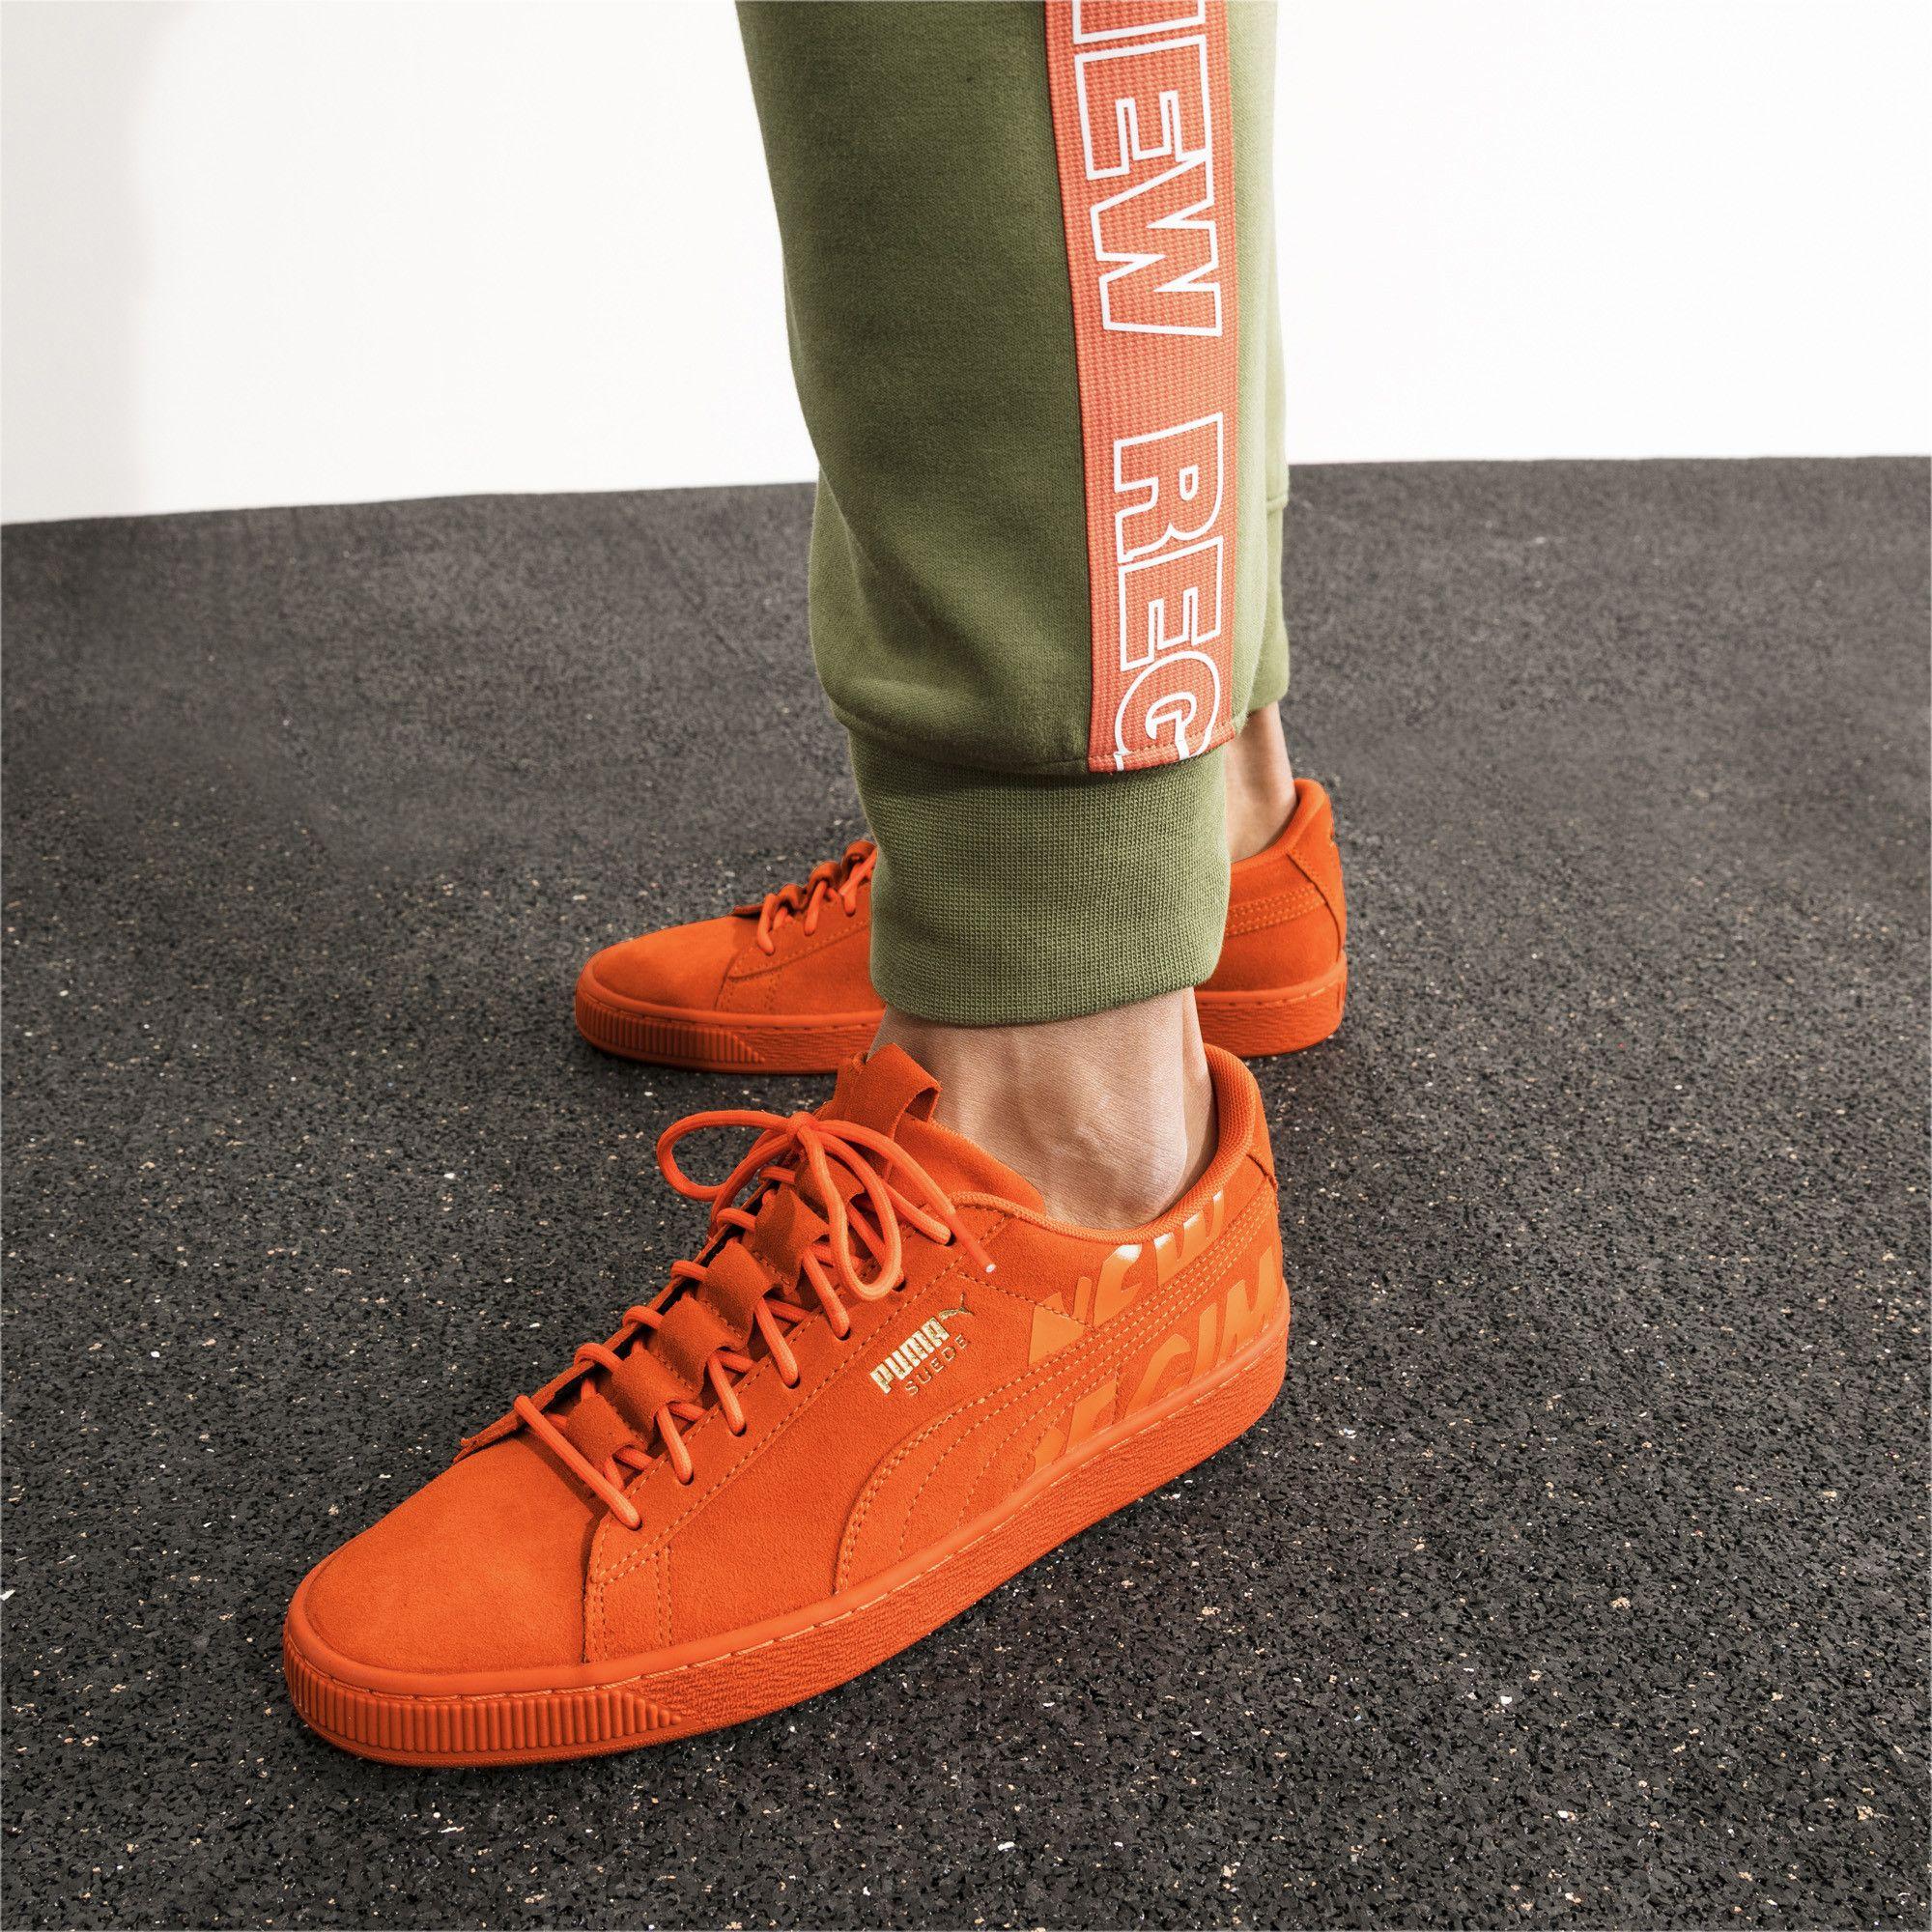 Suede sneakers, Puma shoes women